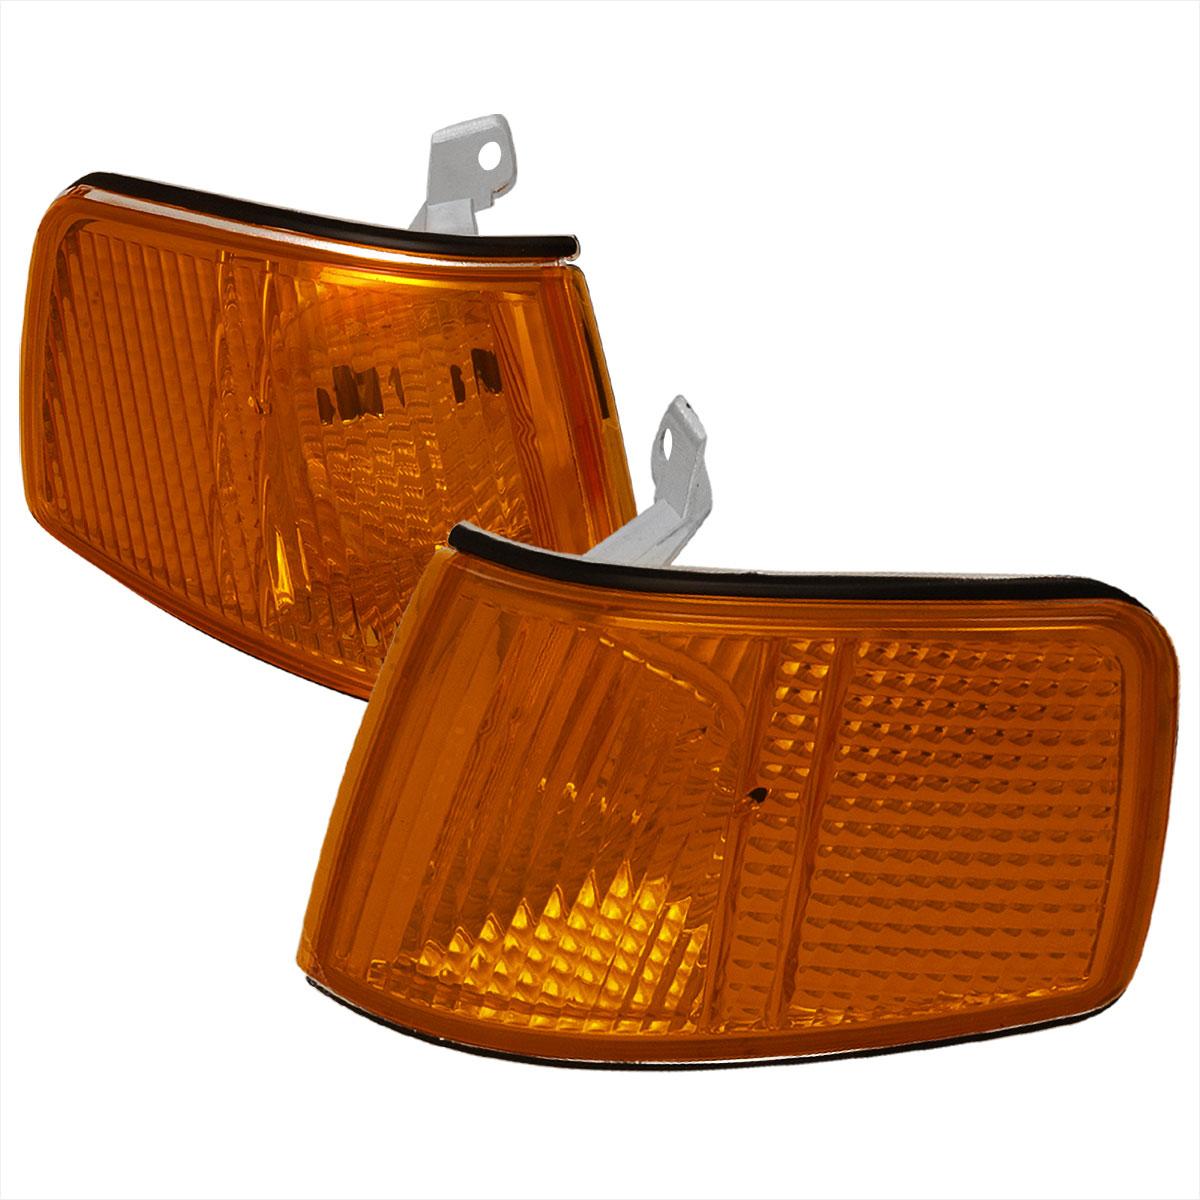 Spec-D Tuning LC-CRX90AM-RS - Spec-D 90-91 Honda Crx Corner Lights - Amber (lc-crx90am-rs)